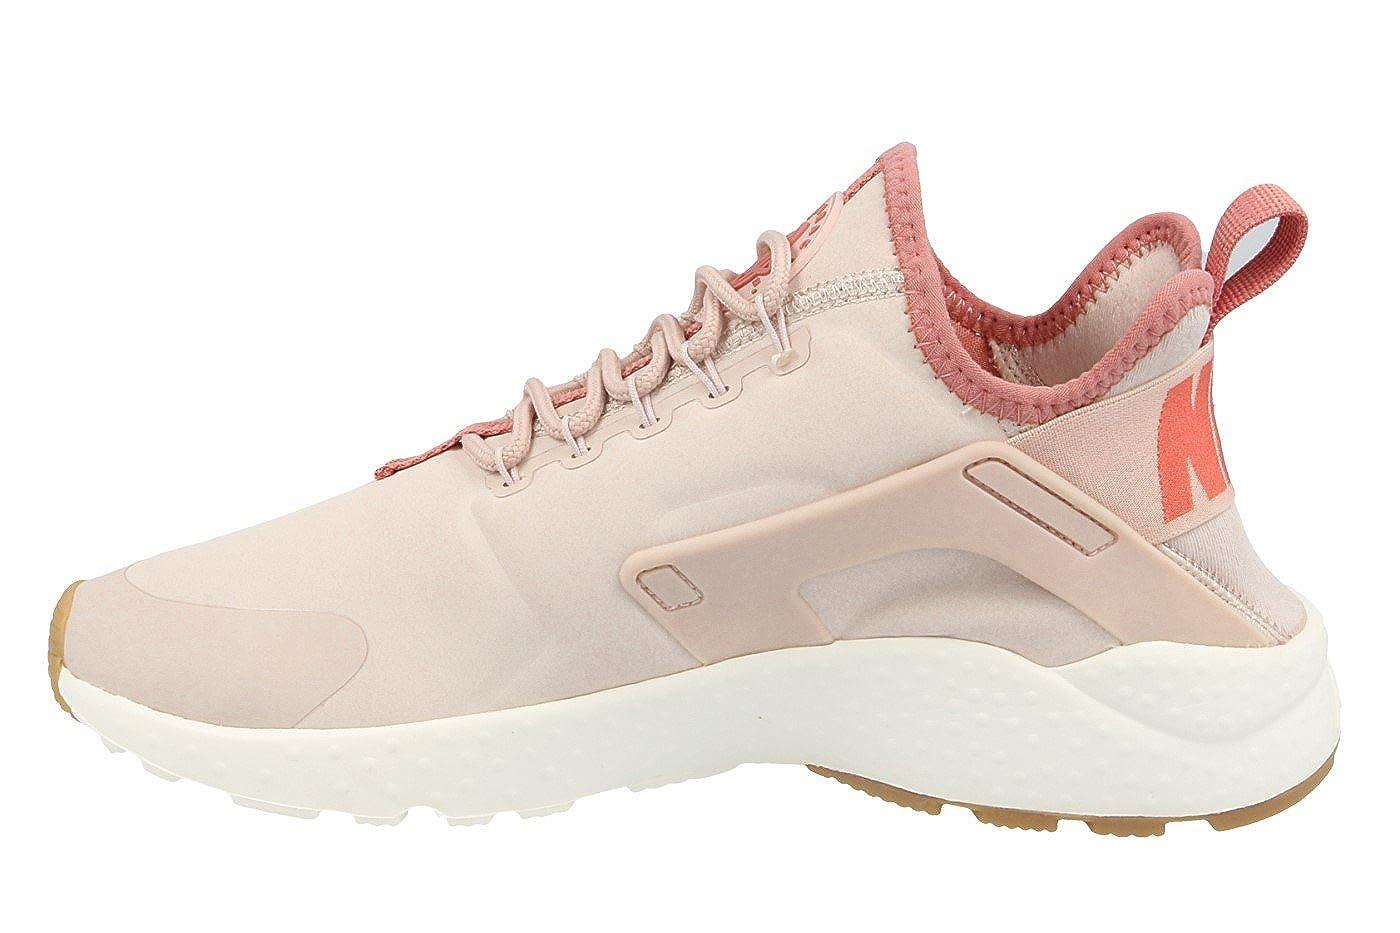 Nike Huarache Run Ultra Turnschuhe Premium Damen Schuhe Turnschuhe Ultra 4096ad